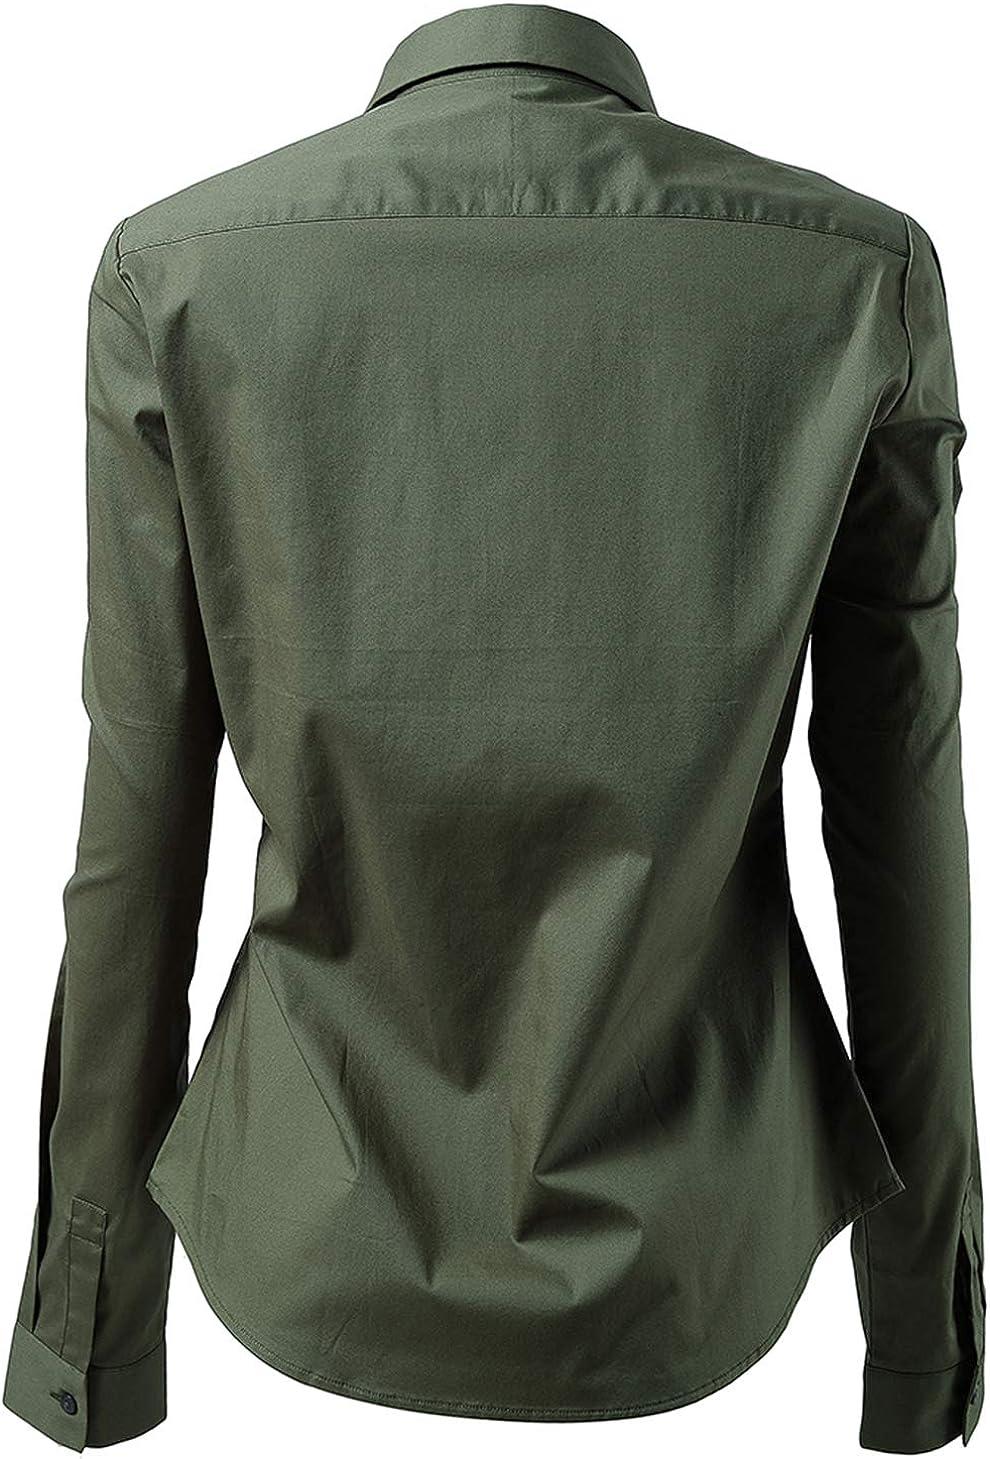 Basic Long//Half Sleeve Slim Fit Casual Button Up Shirt Stretch Formal Shirts Harrms Womens Dress Shirts